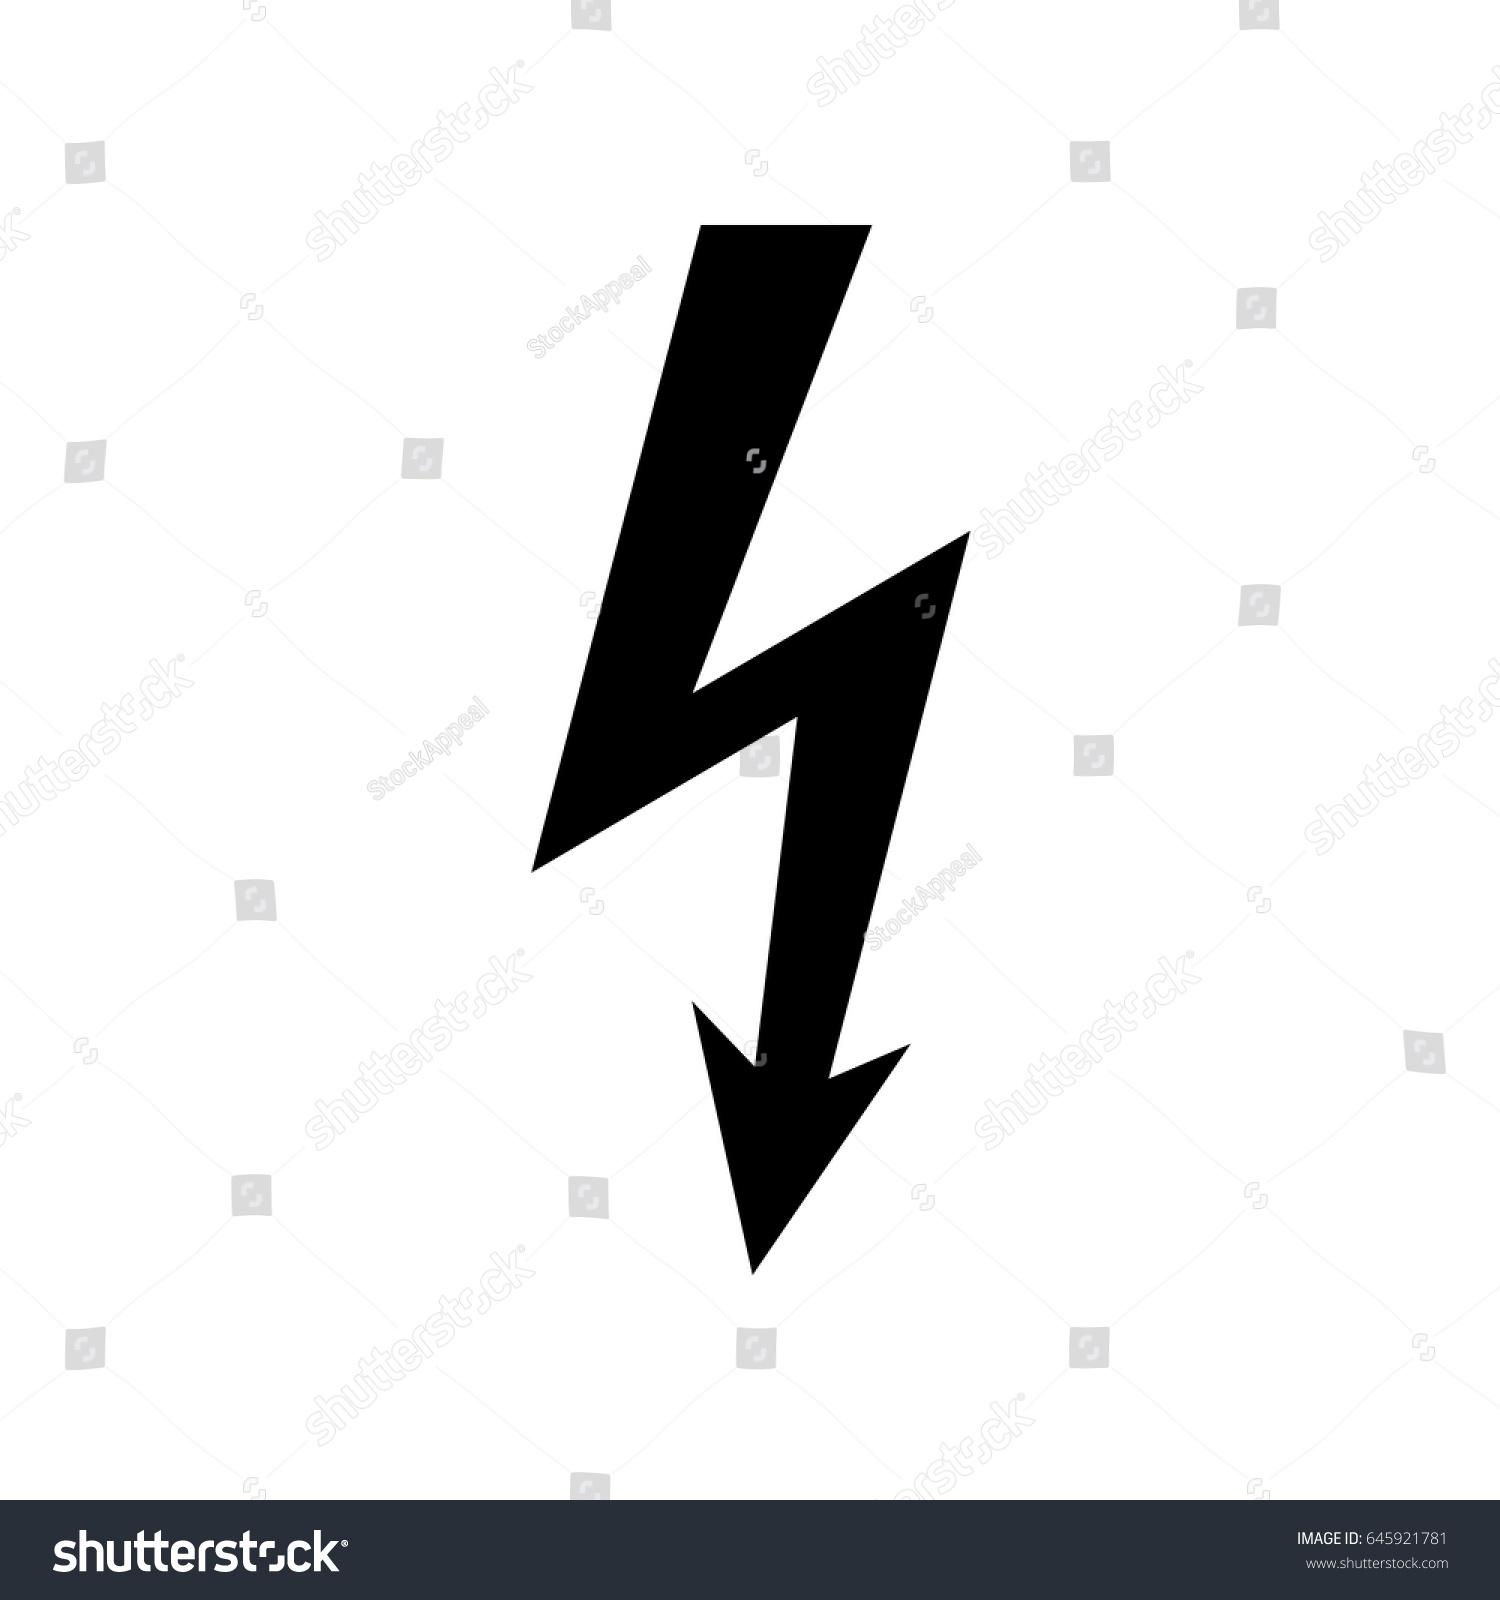 High voltage icon shock warning symbol stock vector 645921781 high voltage icon shock warning symbol buycottarizona